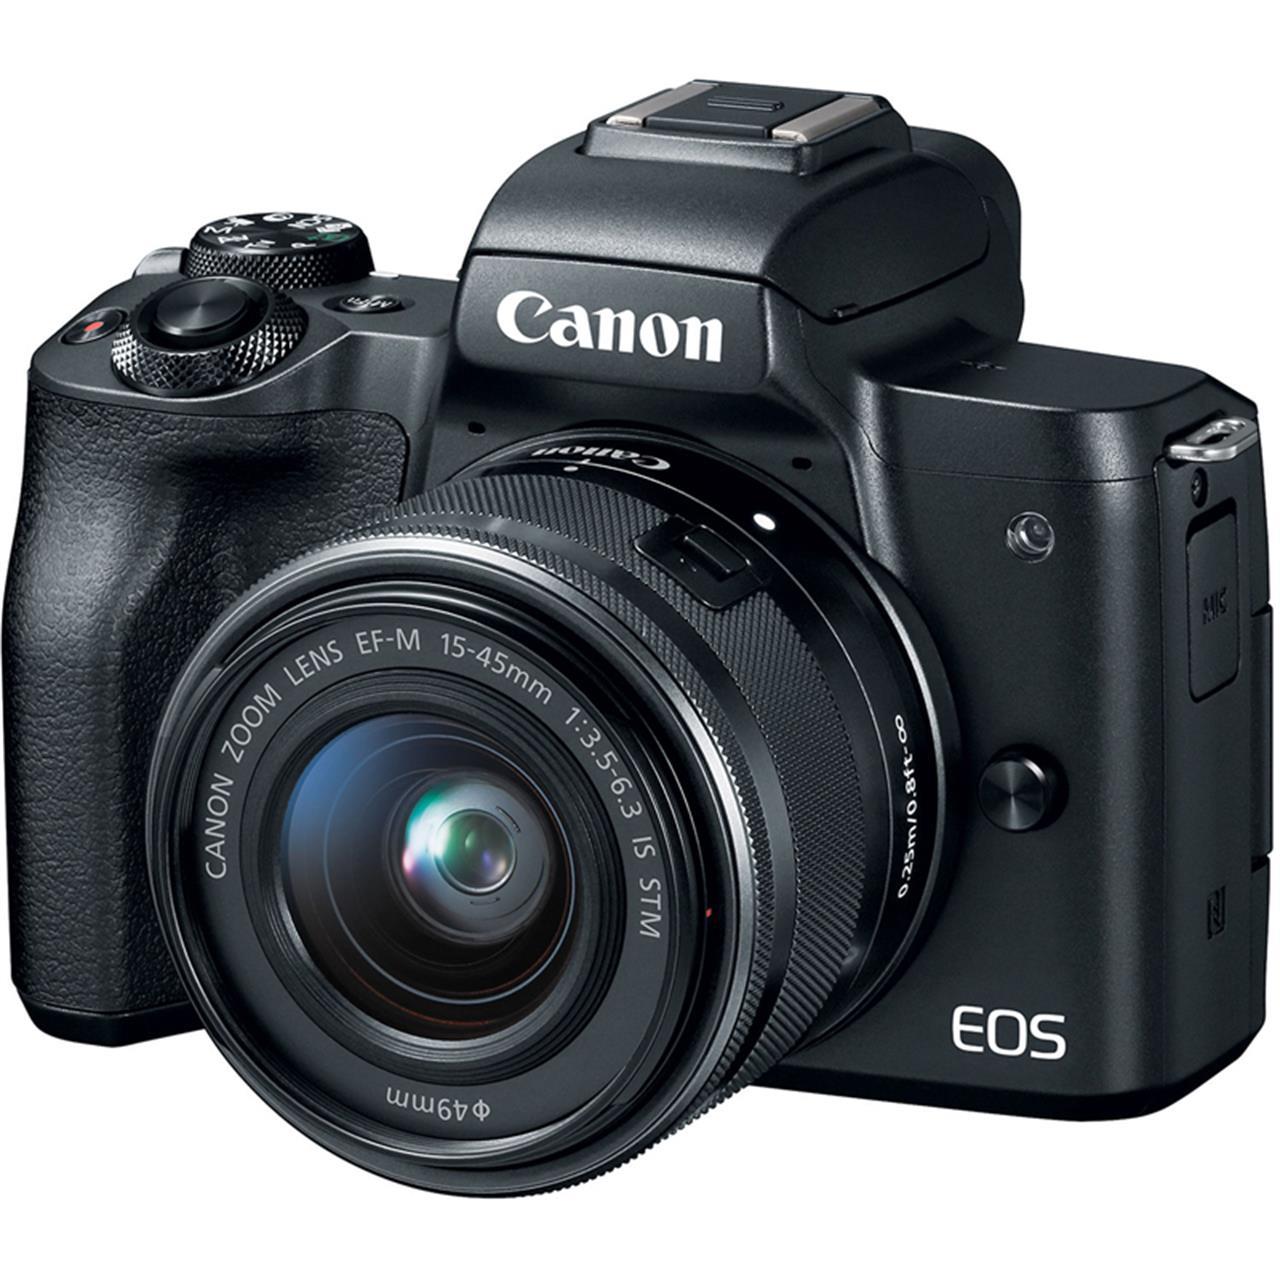 4549292108910__canon_eos_m50_15-45mm_hofma.jpg